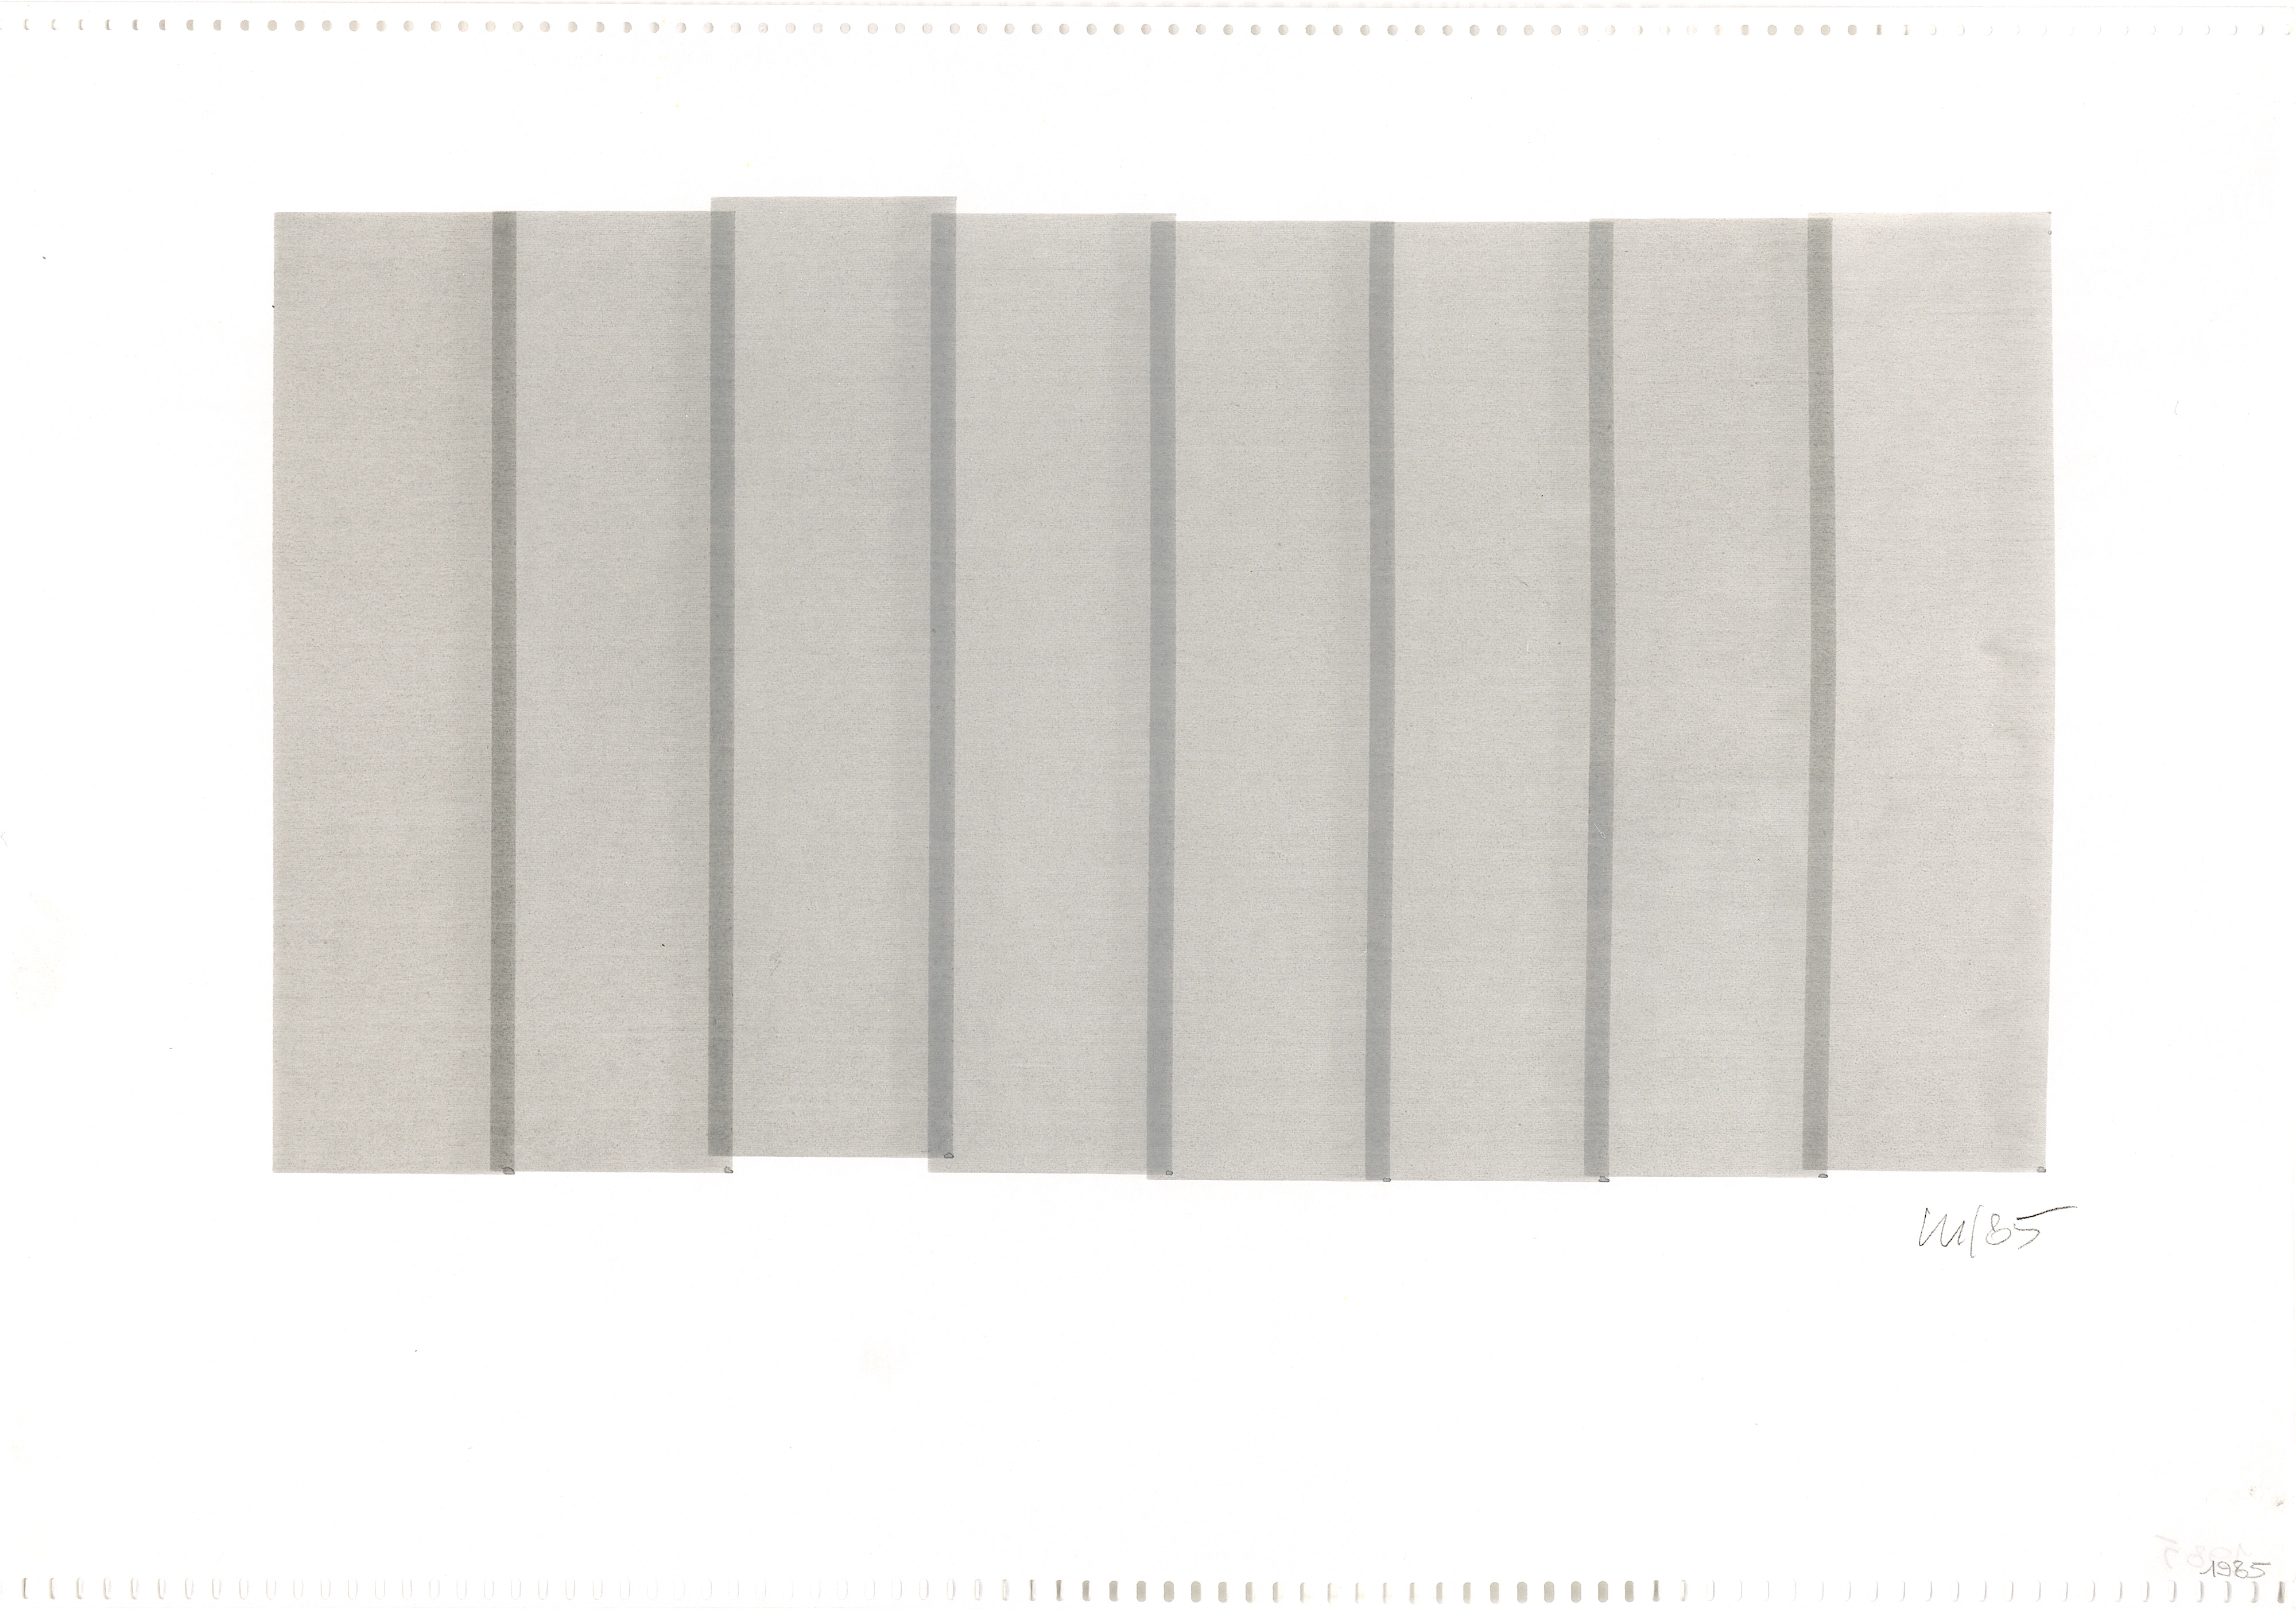 Vera Molnar, 8 Colonnes (vertical), plotter drawing, 19 x 33, 1985